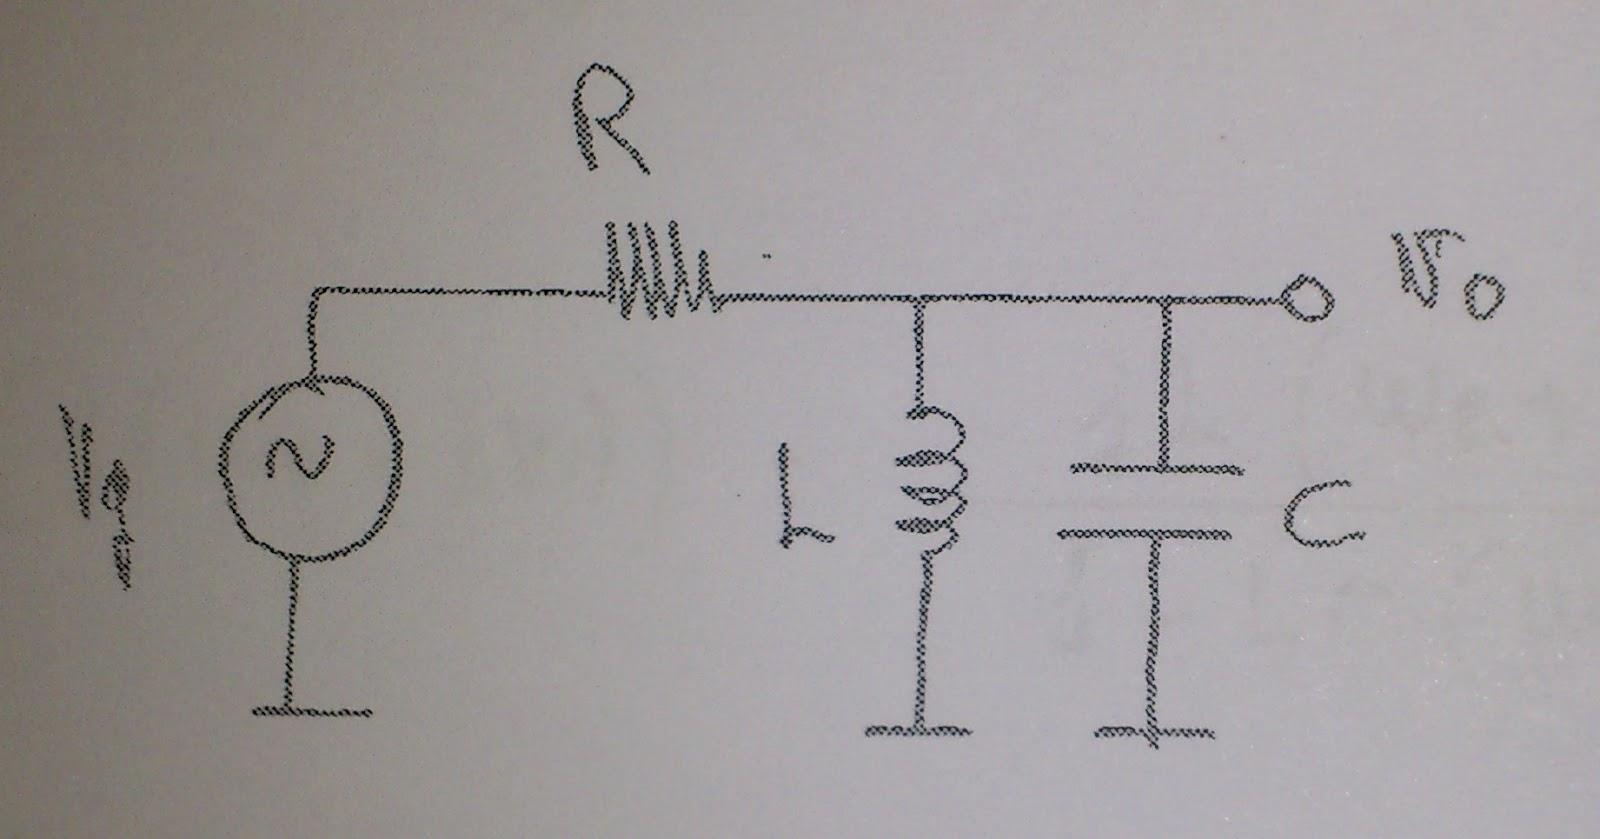 Circuito Rl : Esercizio circuito rl fem onda quadra youtube